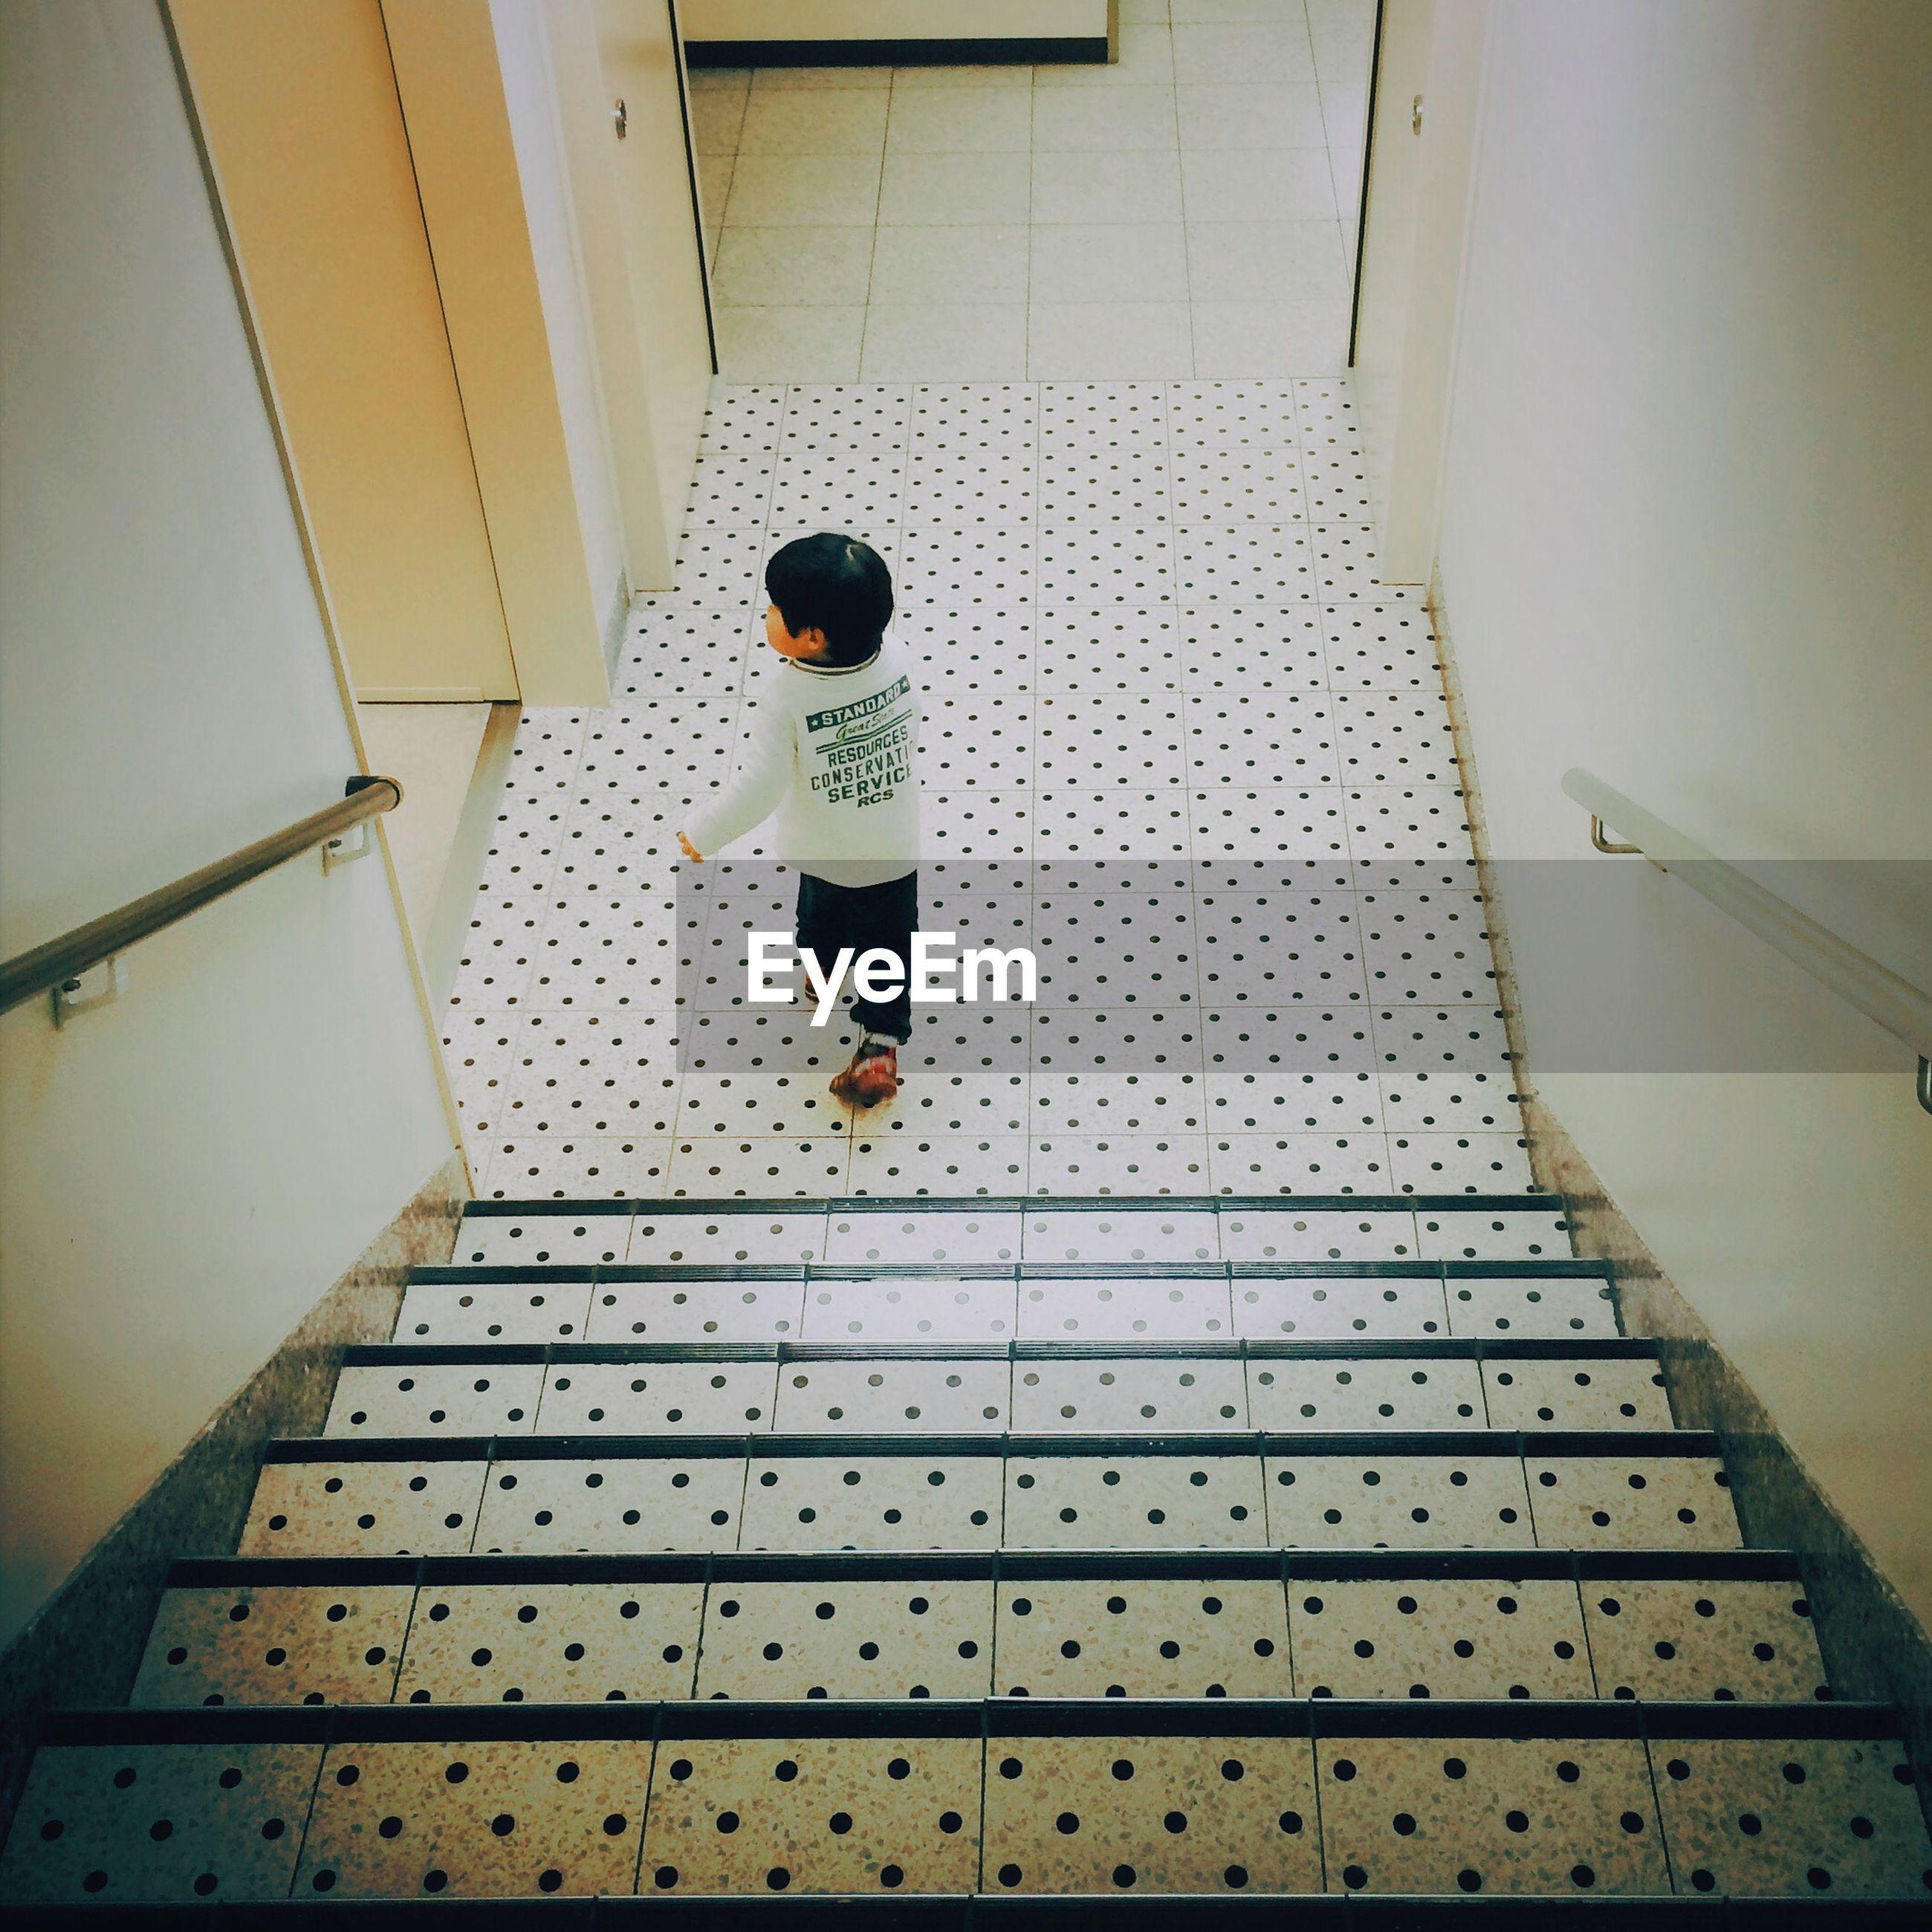 Full length rear view of child walking on corridor